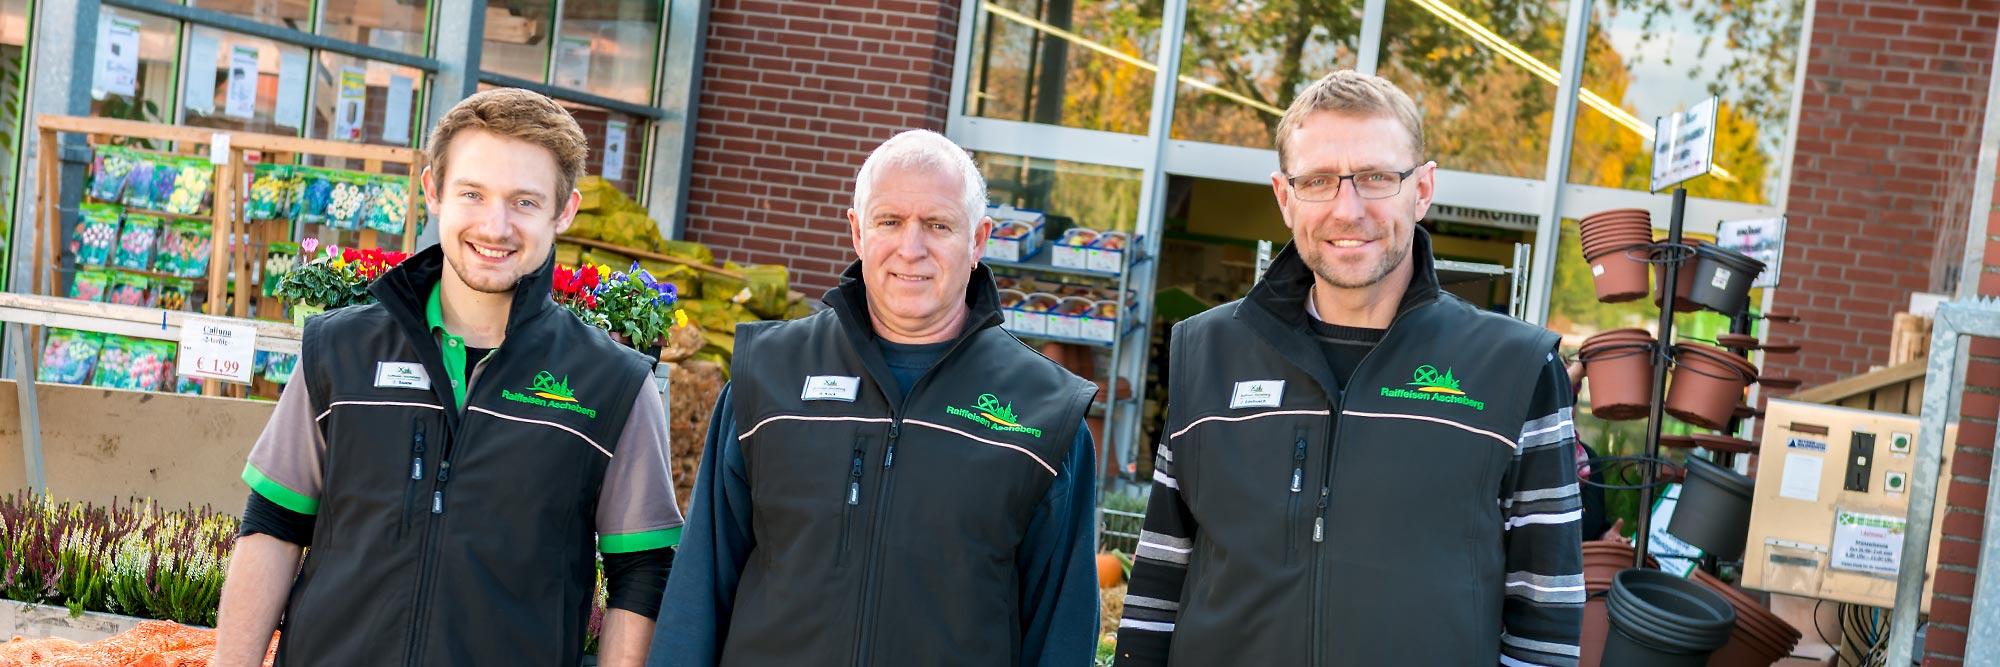 Raiffeisen Markt Ottmarsbocholt Team